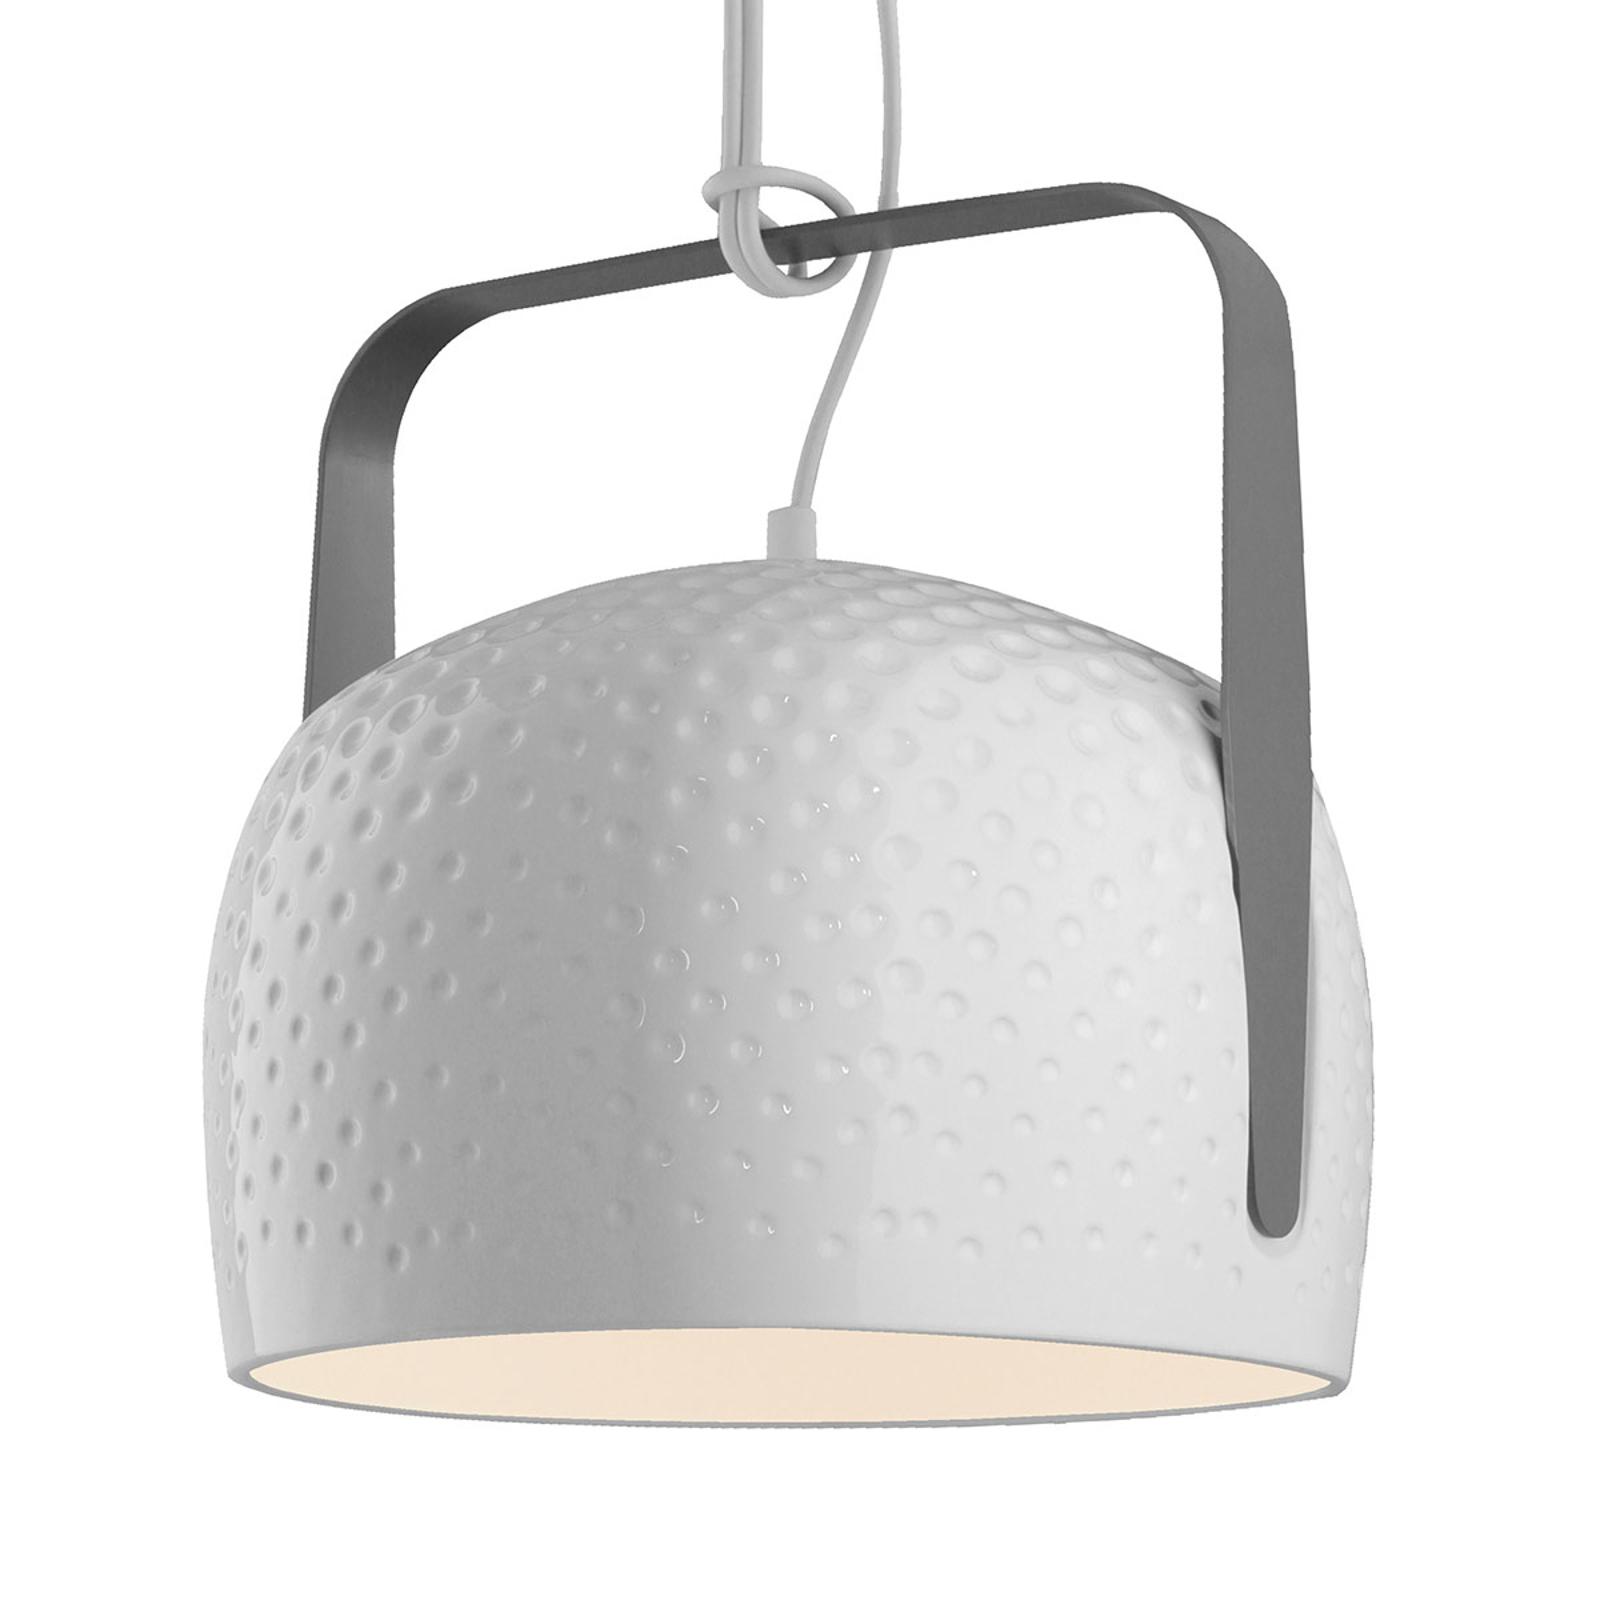 Karman Bag - biała lampa wisząca Ø 32 cm struktura